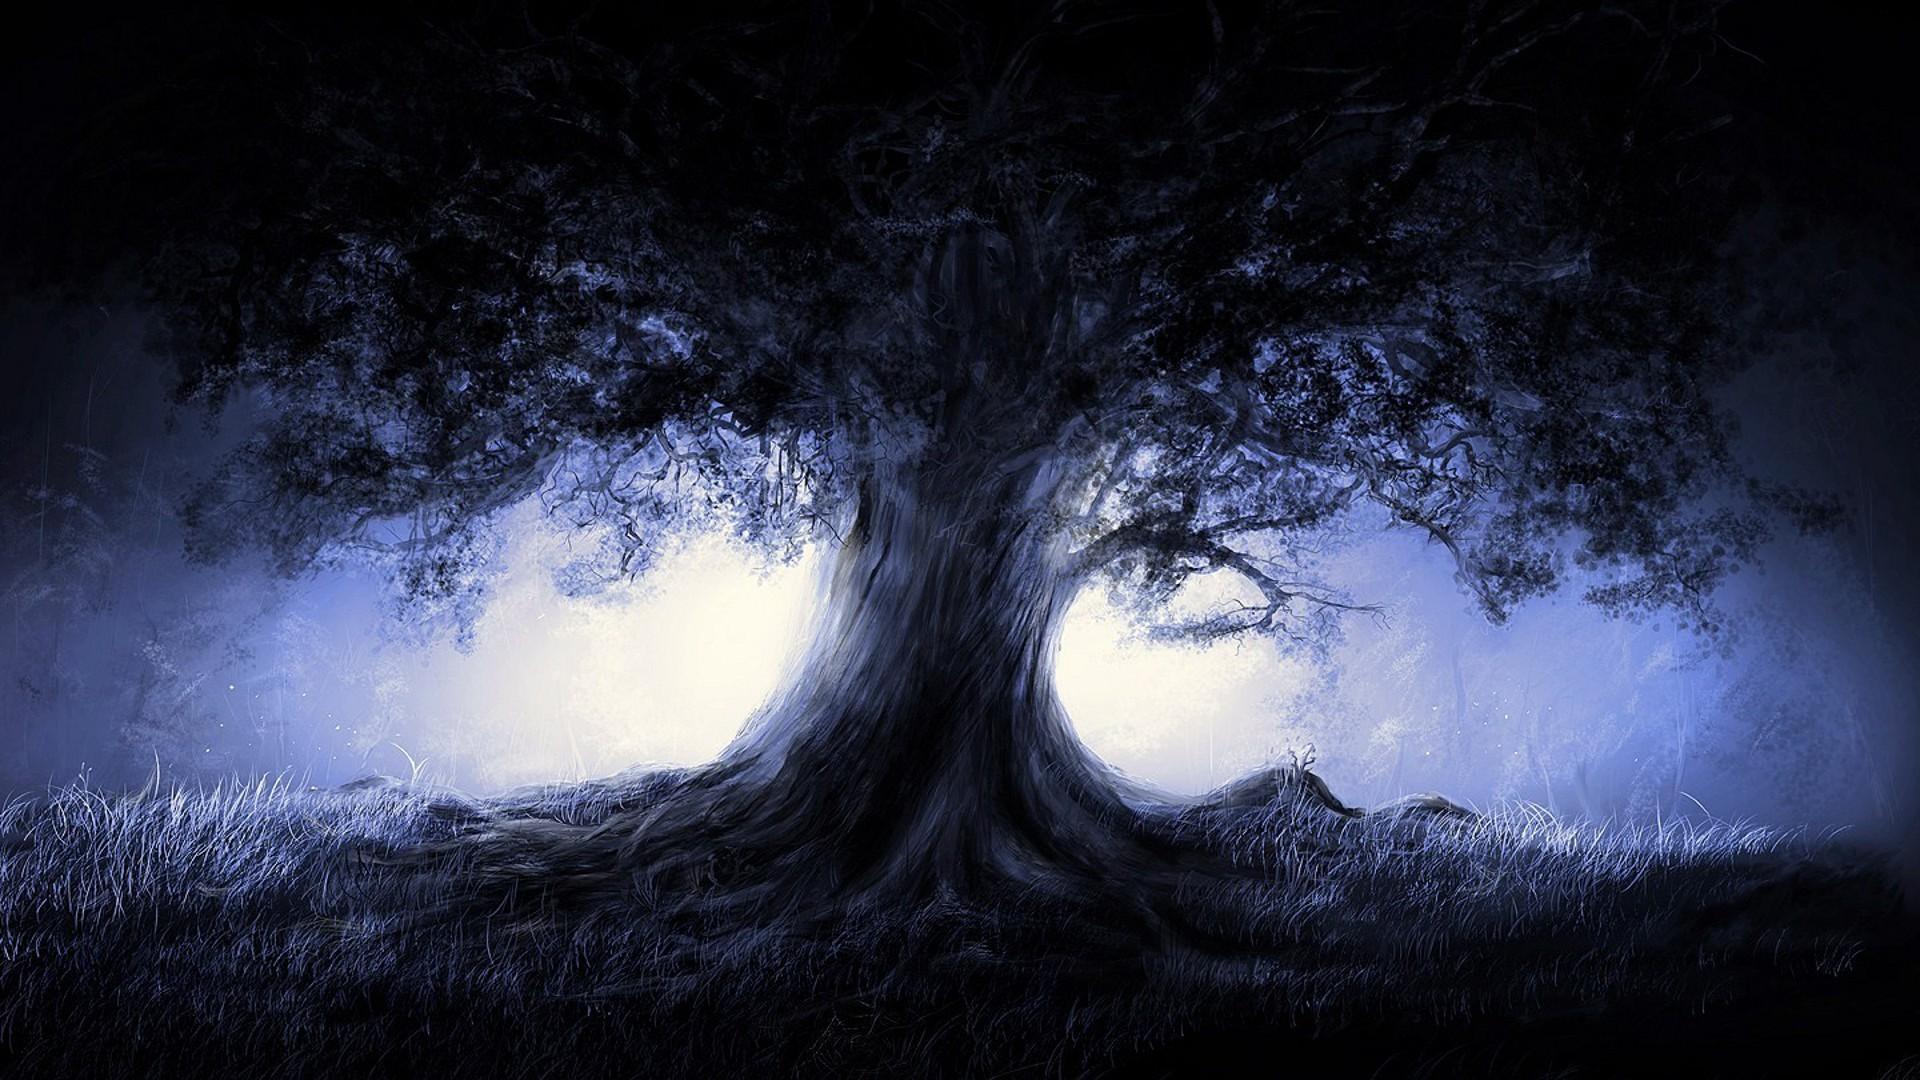 Free Widescreen Fantasy Wallpapers Tree 1366×7 #4324 Wallpaper | Wolimej.Com